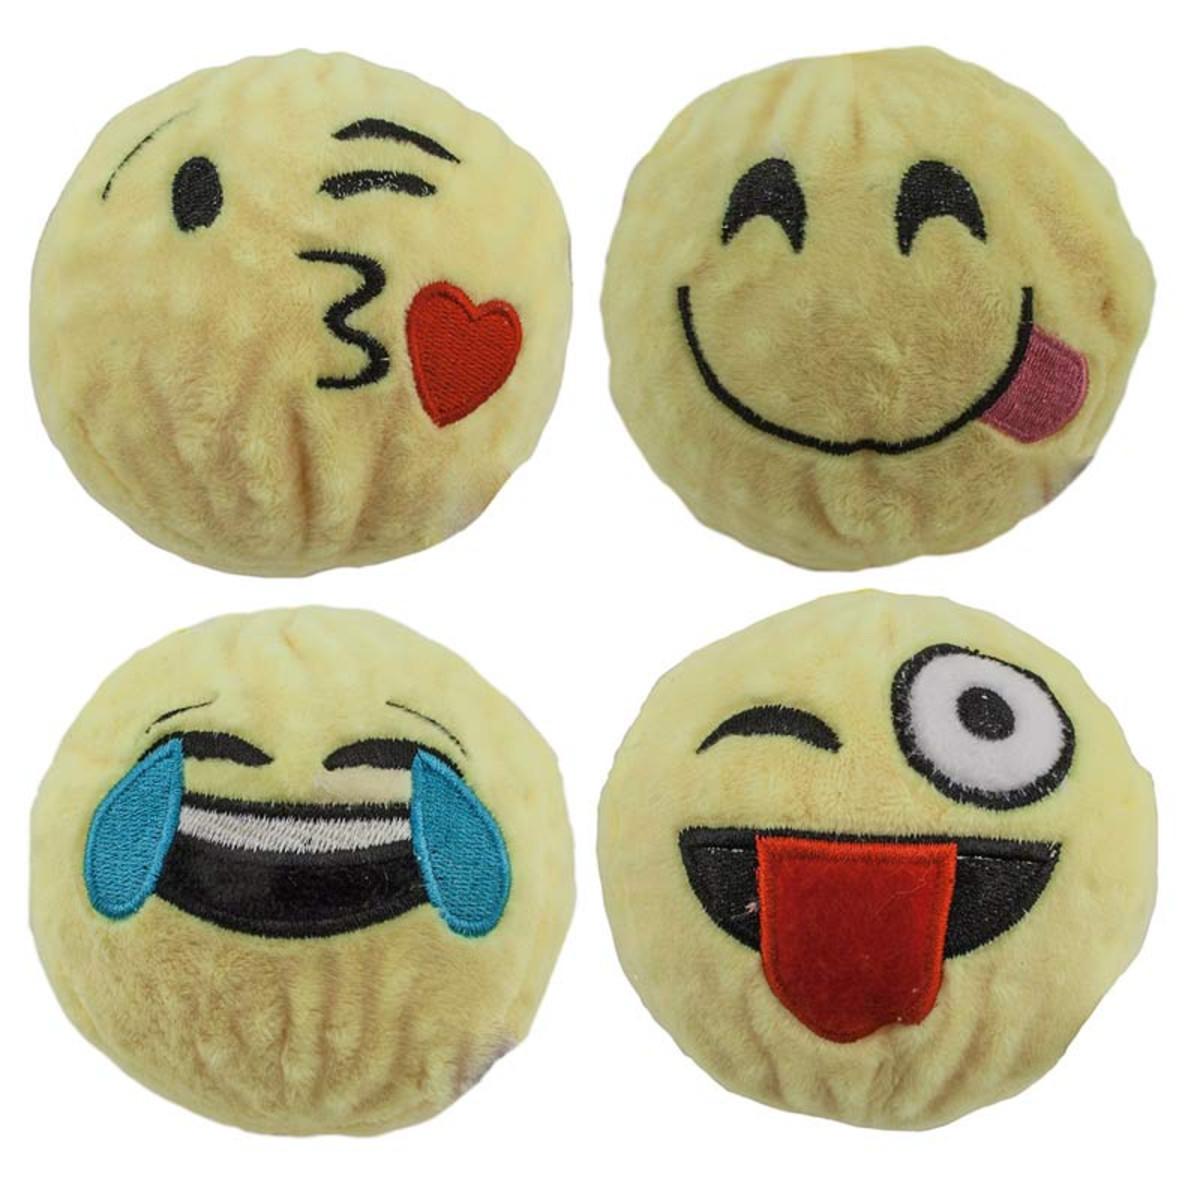 4 inch Dawgeee Toy EMOJI Ball - Various Designs